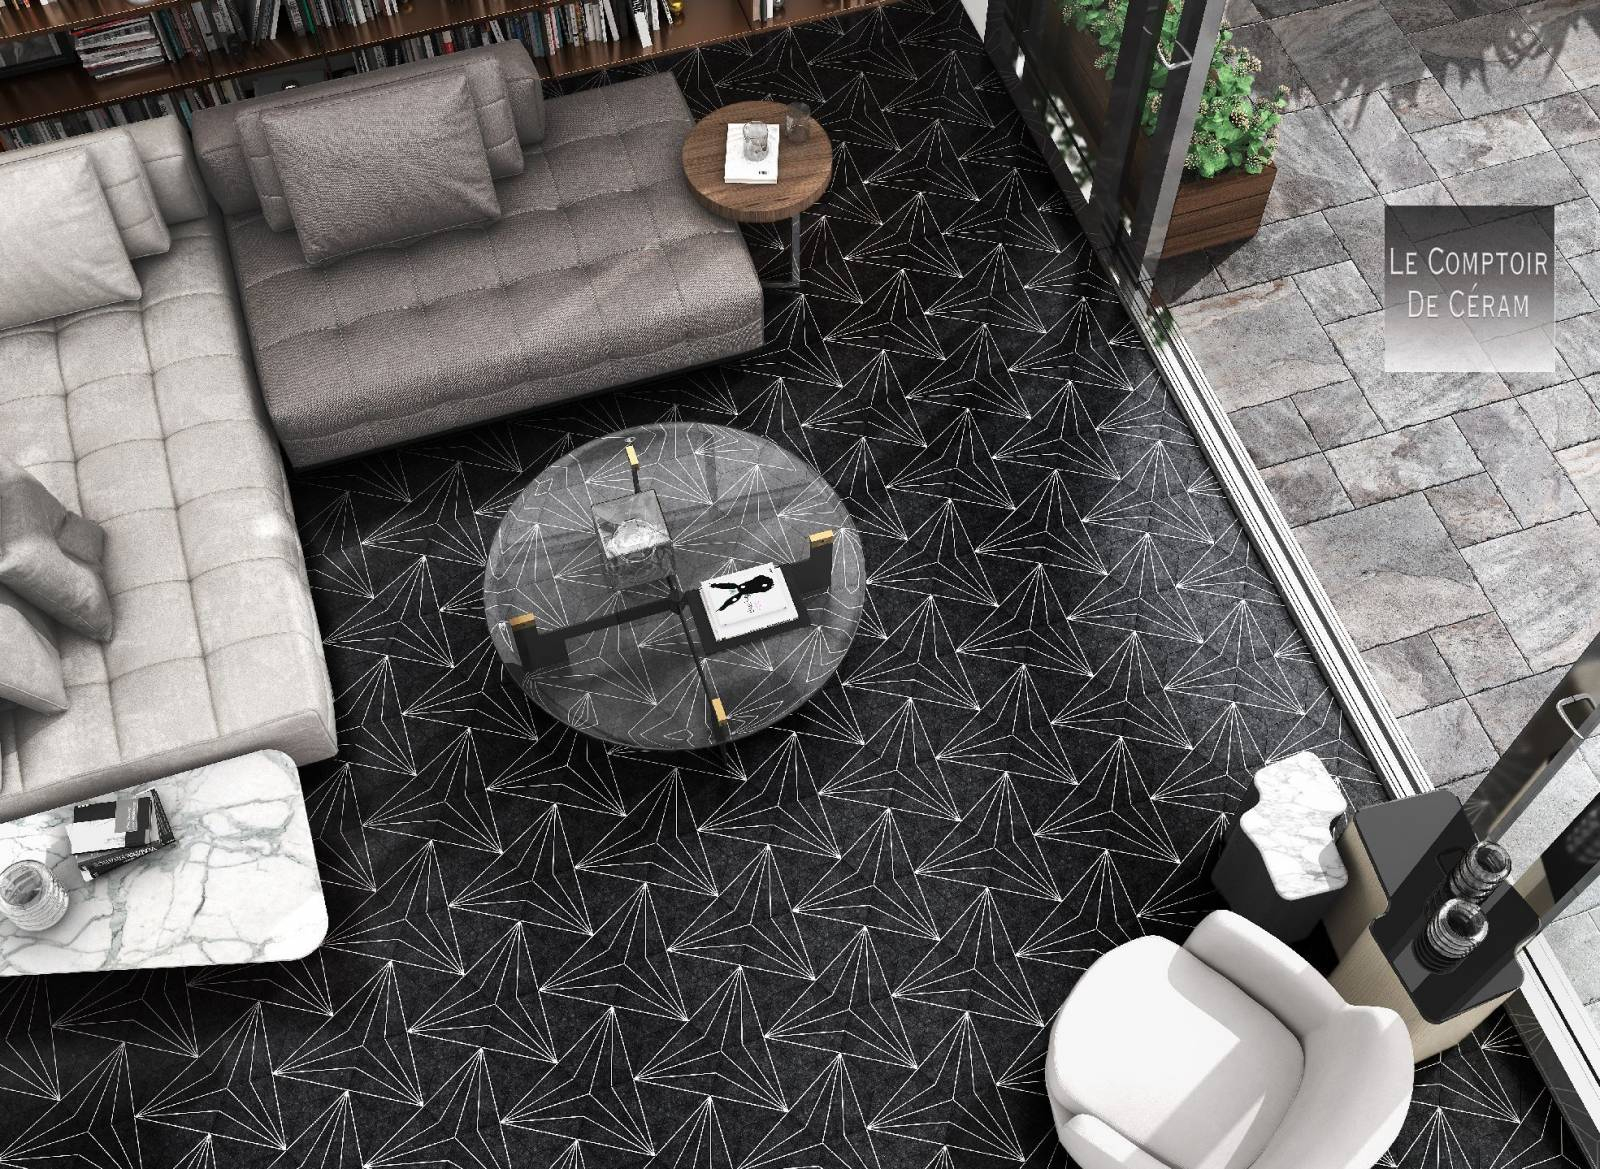 Carrelage Hexagonal Sol Et Mur Formes Géométriques Noir Et ... à Carrelage Sol Hexagonal